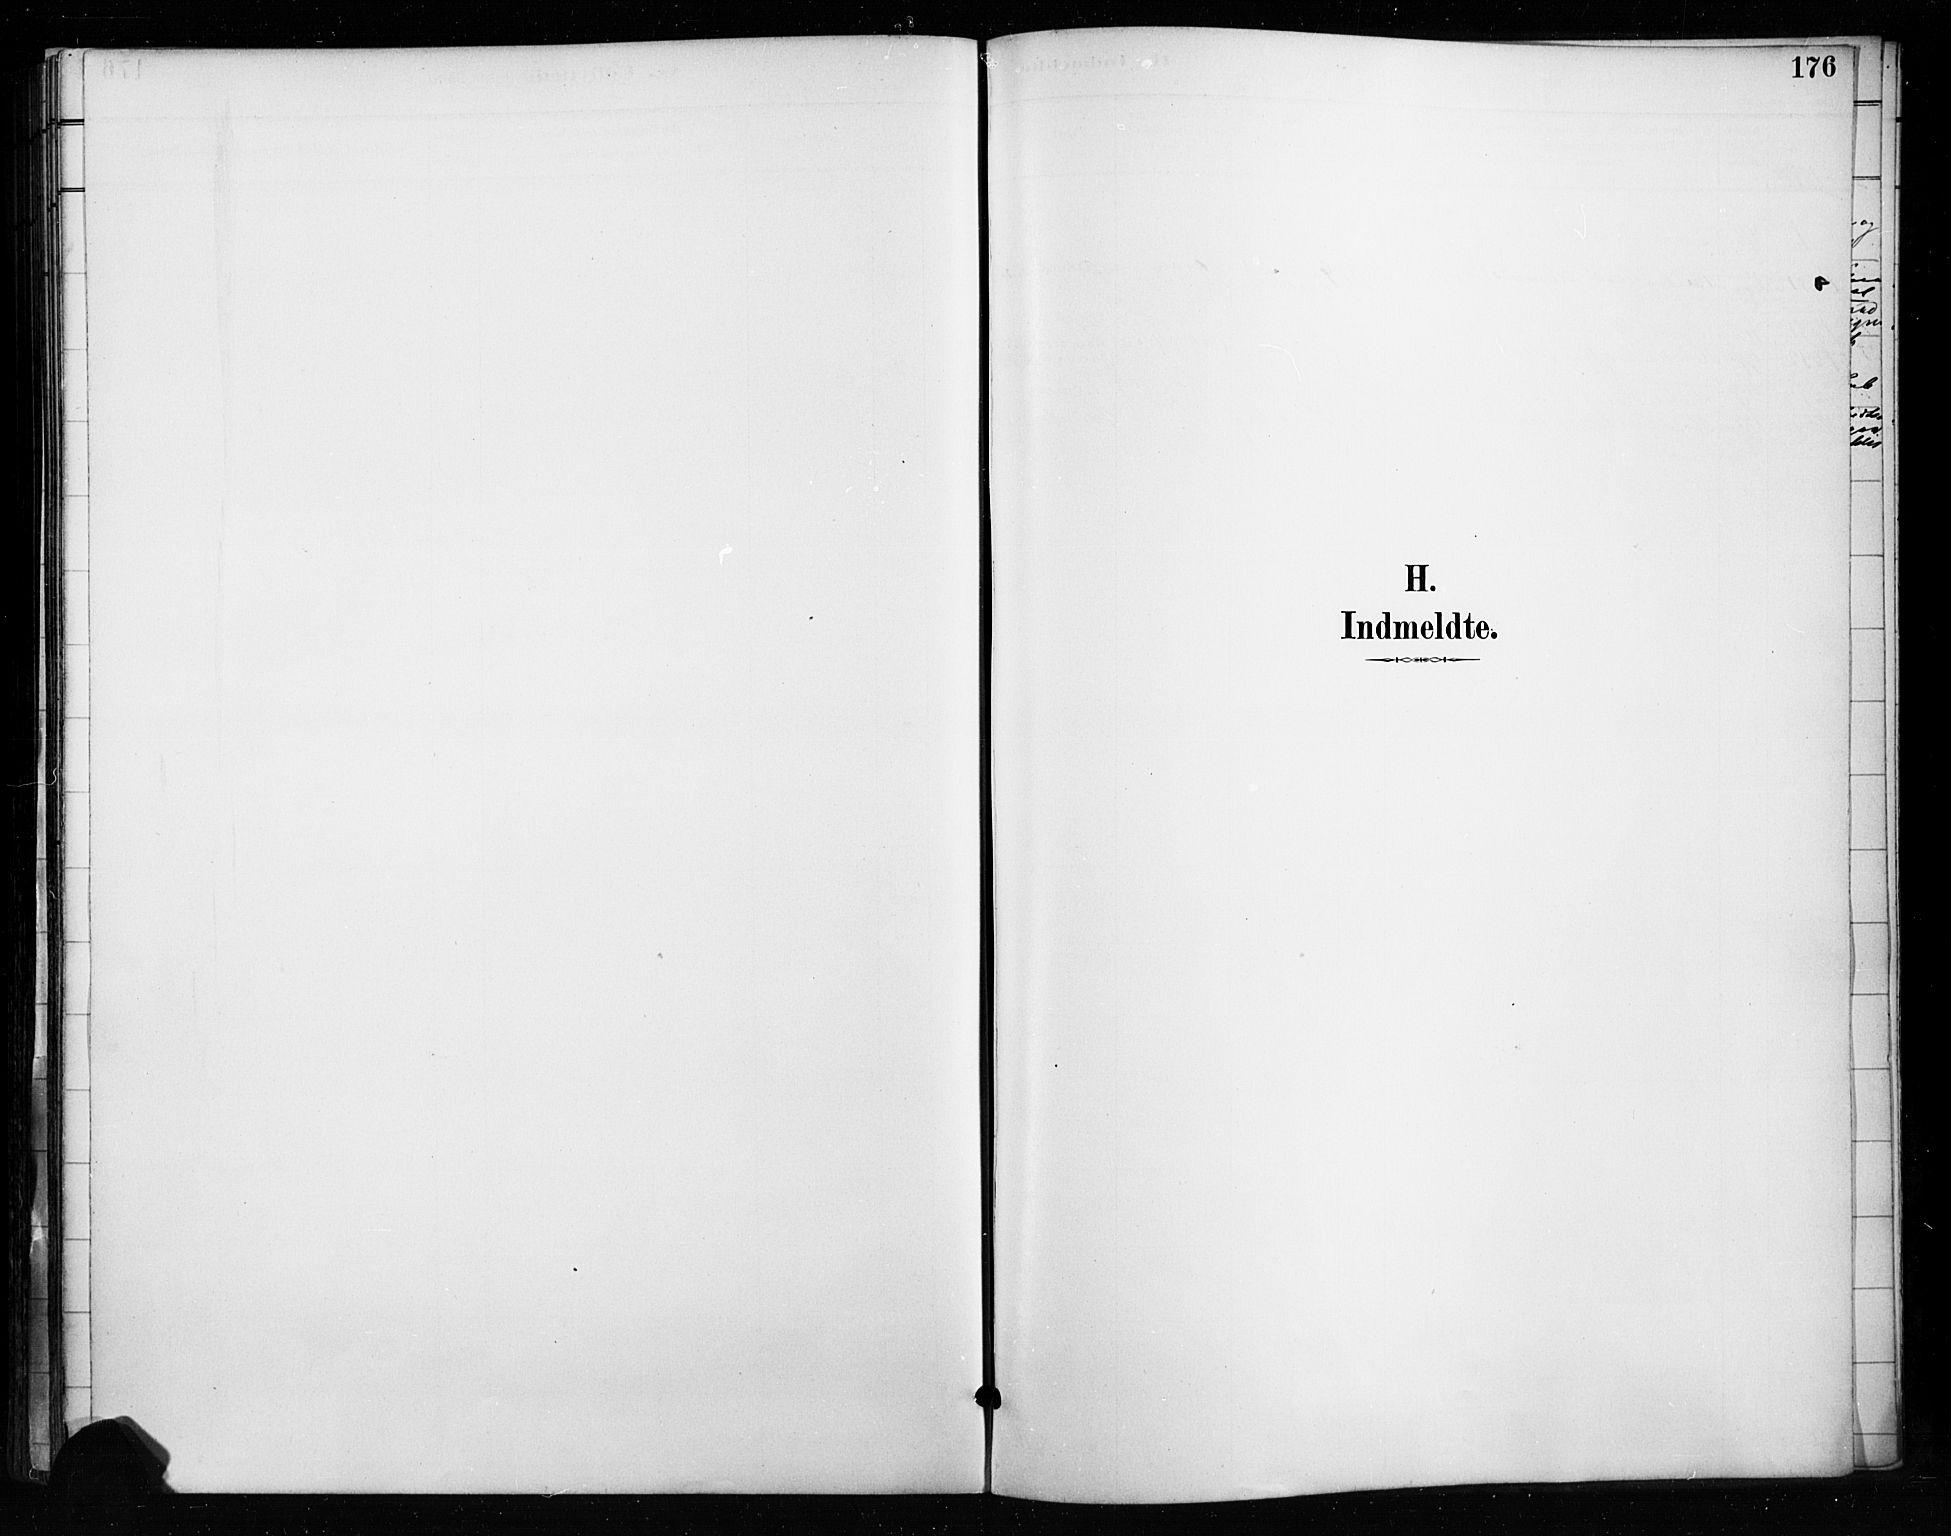 SAH, Gran prestekontor, Ministerialbok nr. 18, 1889-1899, s. 176